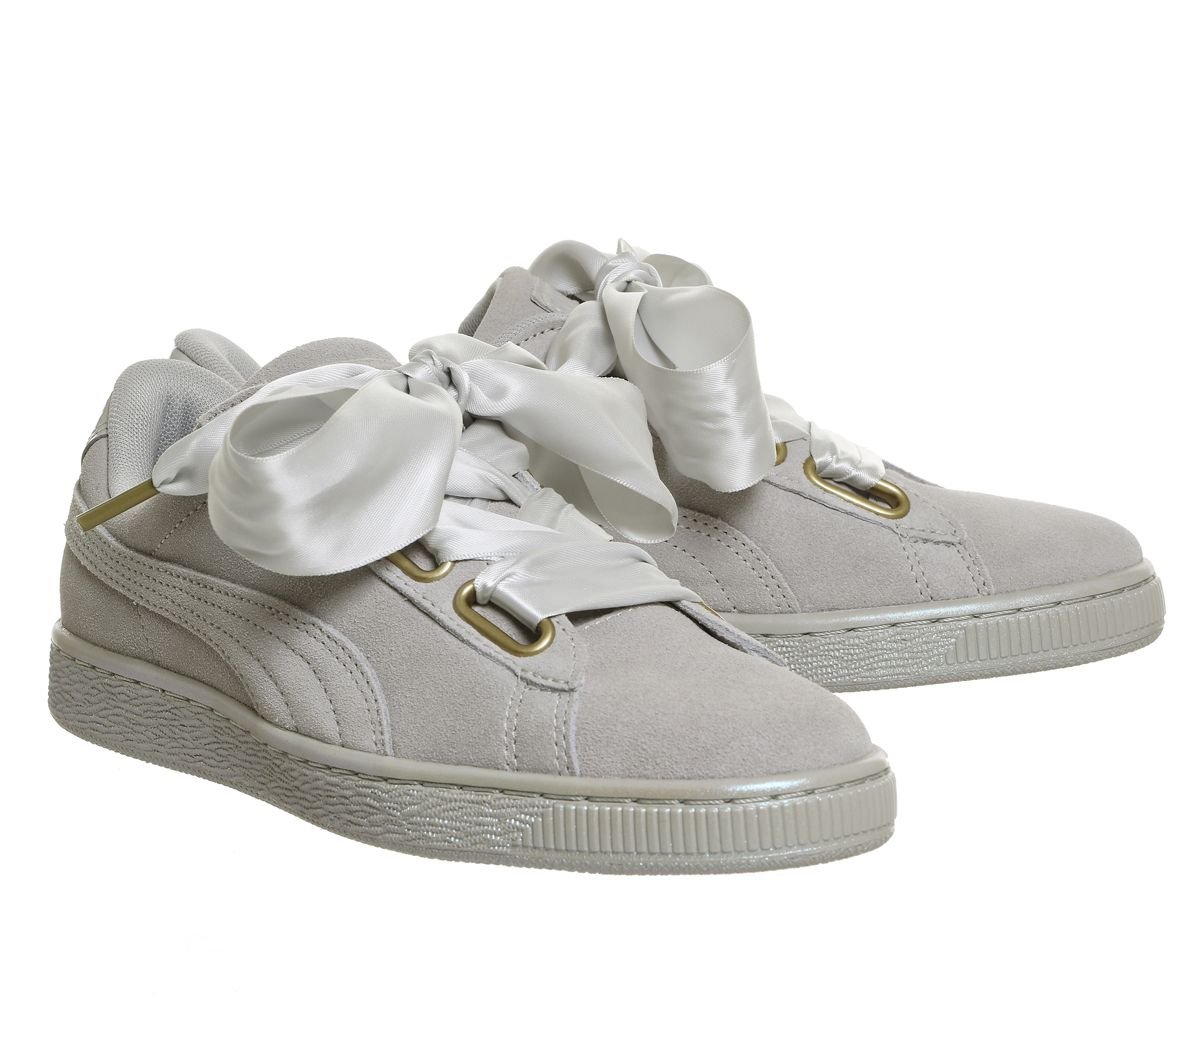 56100789d2653f SENTINEL Donna Puma Suede cuore grigio viola raso scarpe da ginnastica  scarpe